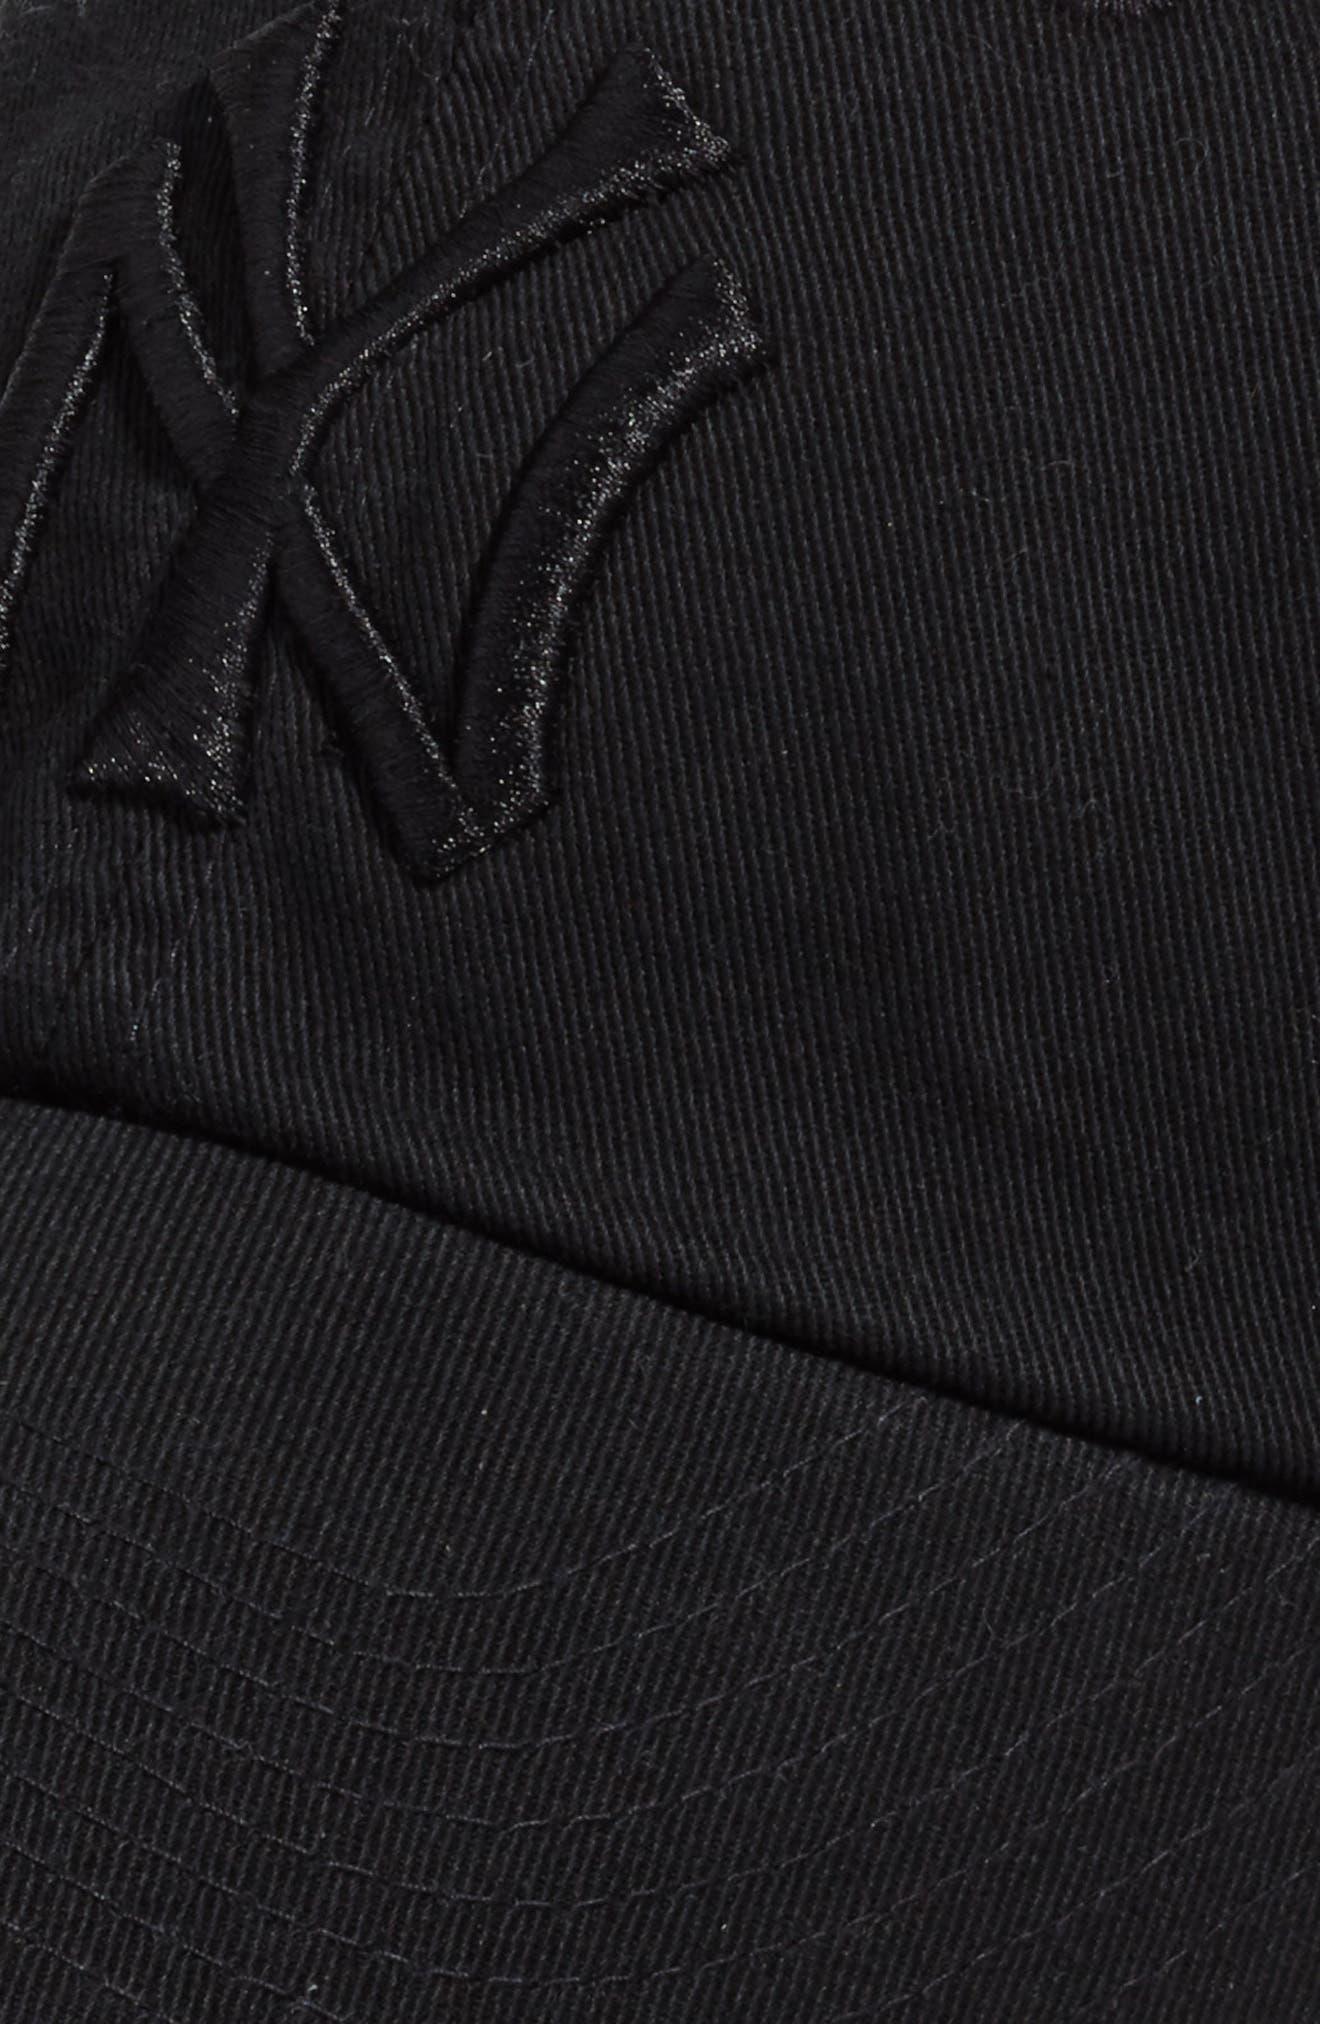 Ballpark - New York Yankees Baseball Cap,                             Alternate thumbnail 3, color,                             001